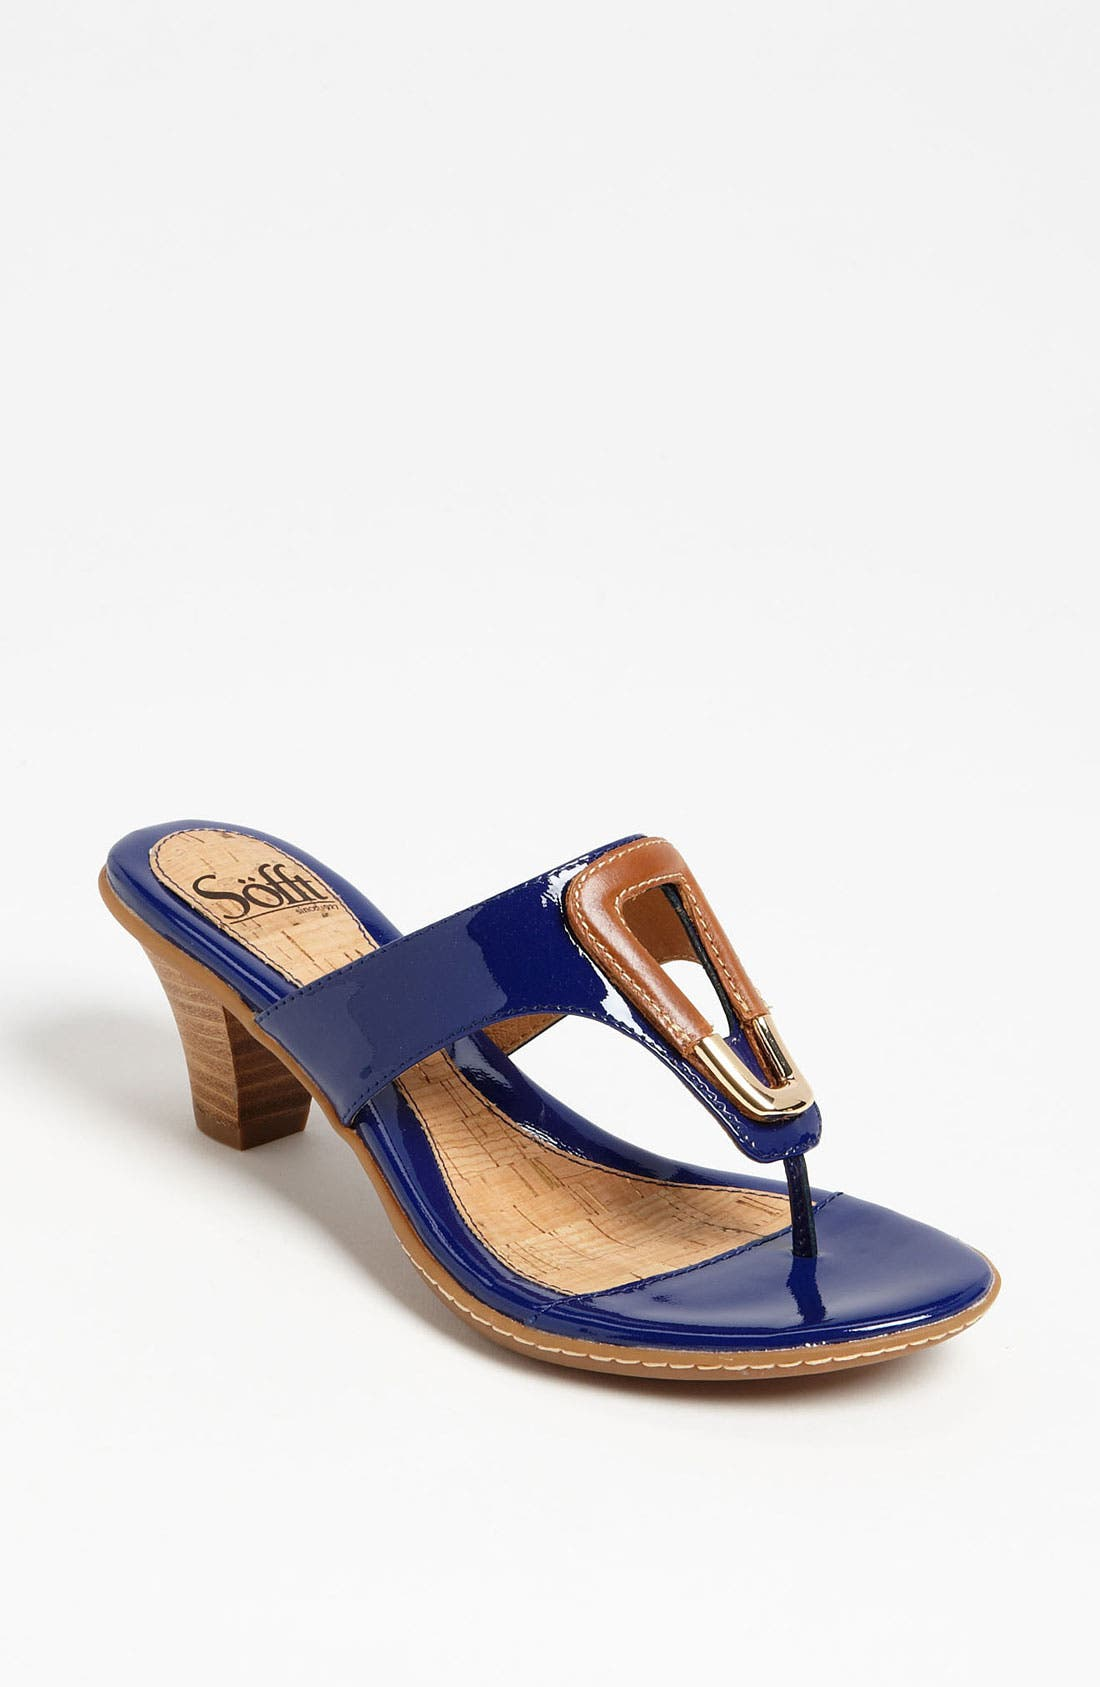 Main Image - Söfft 'Raphaella' Sandal